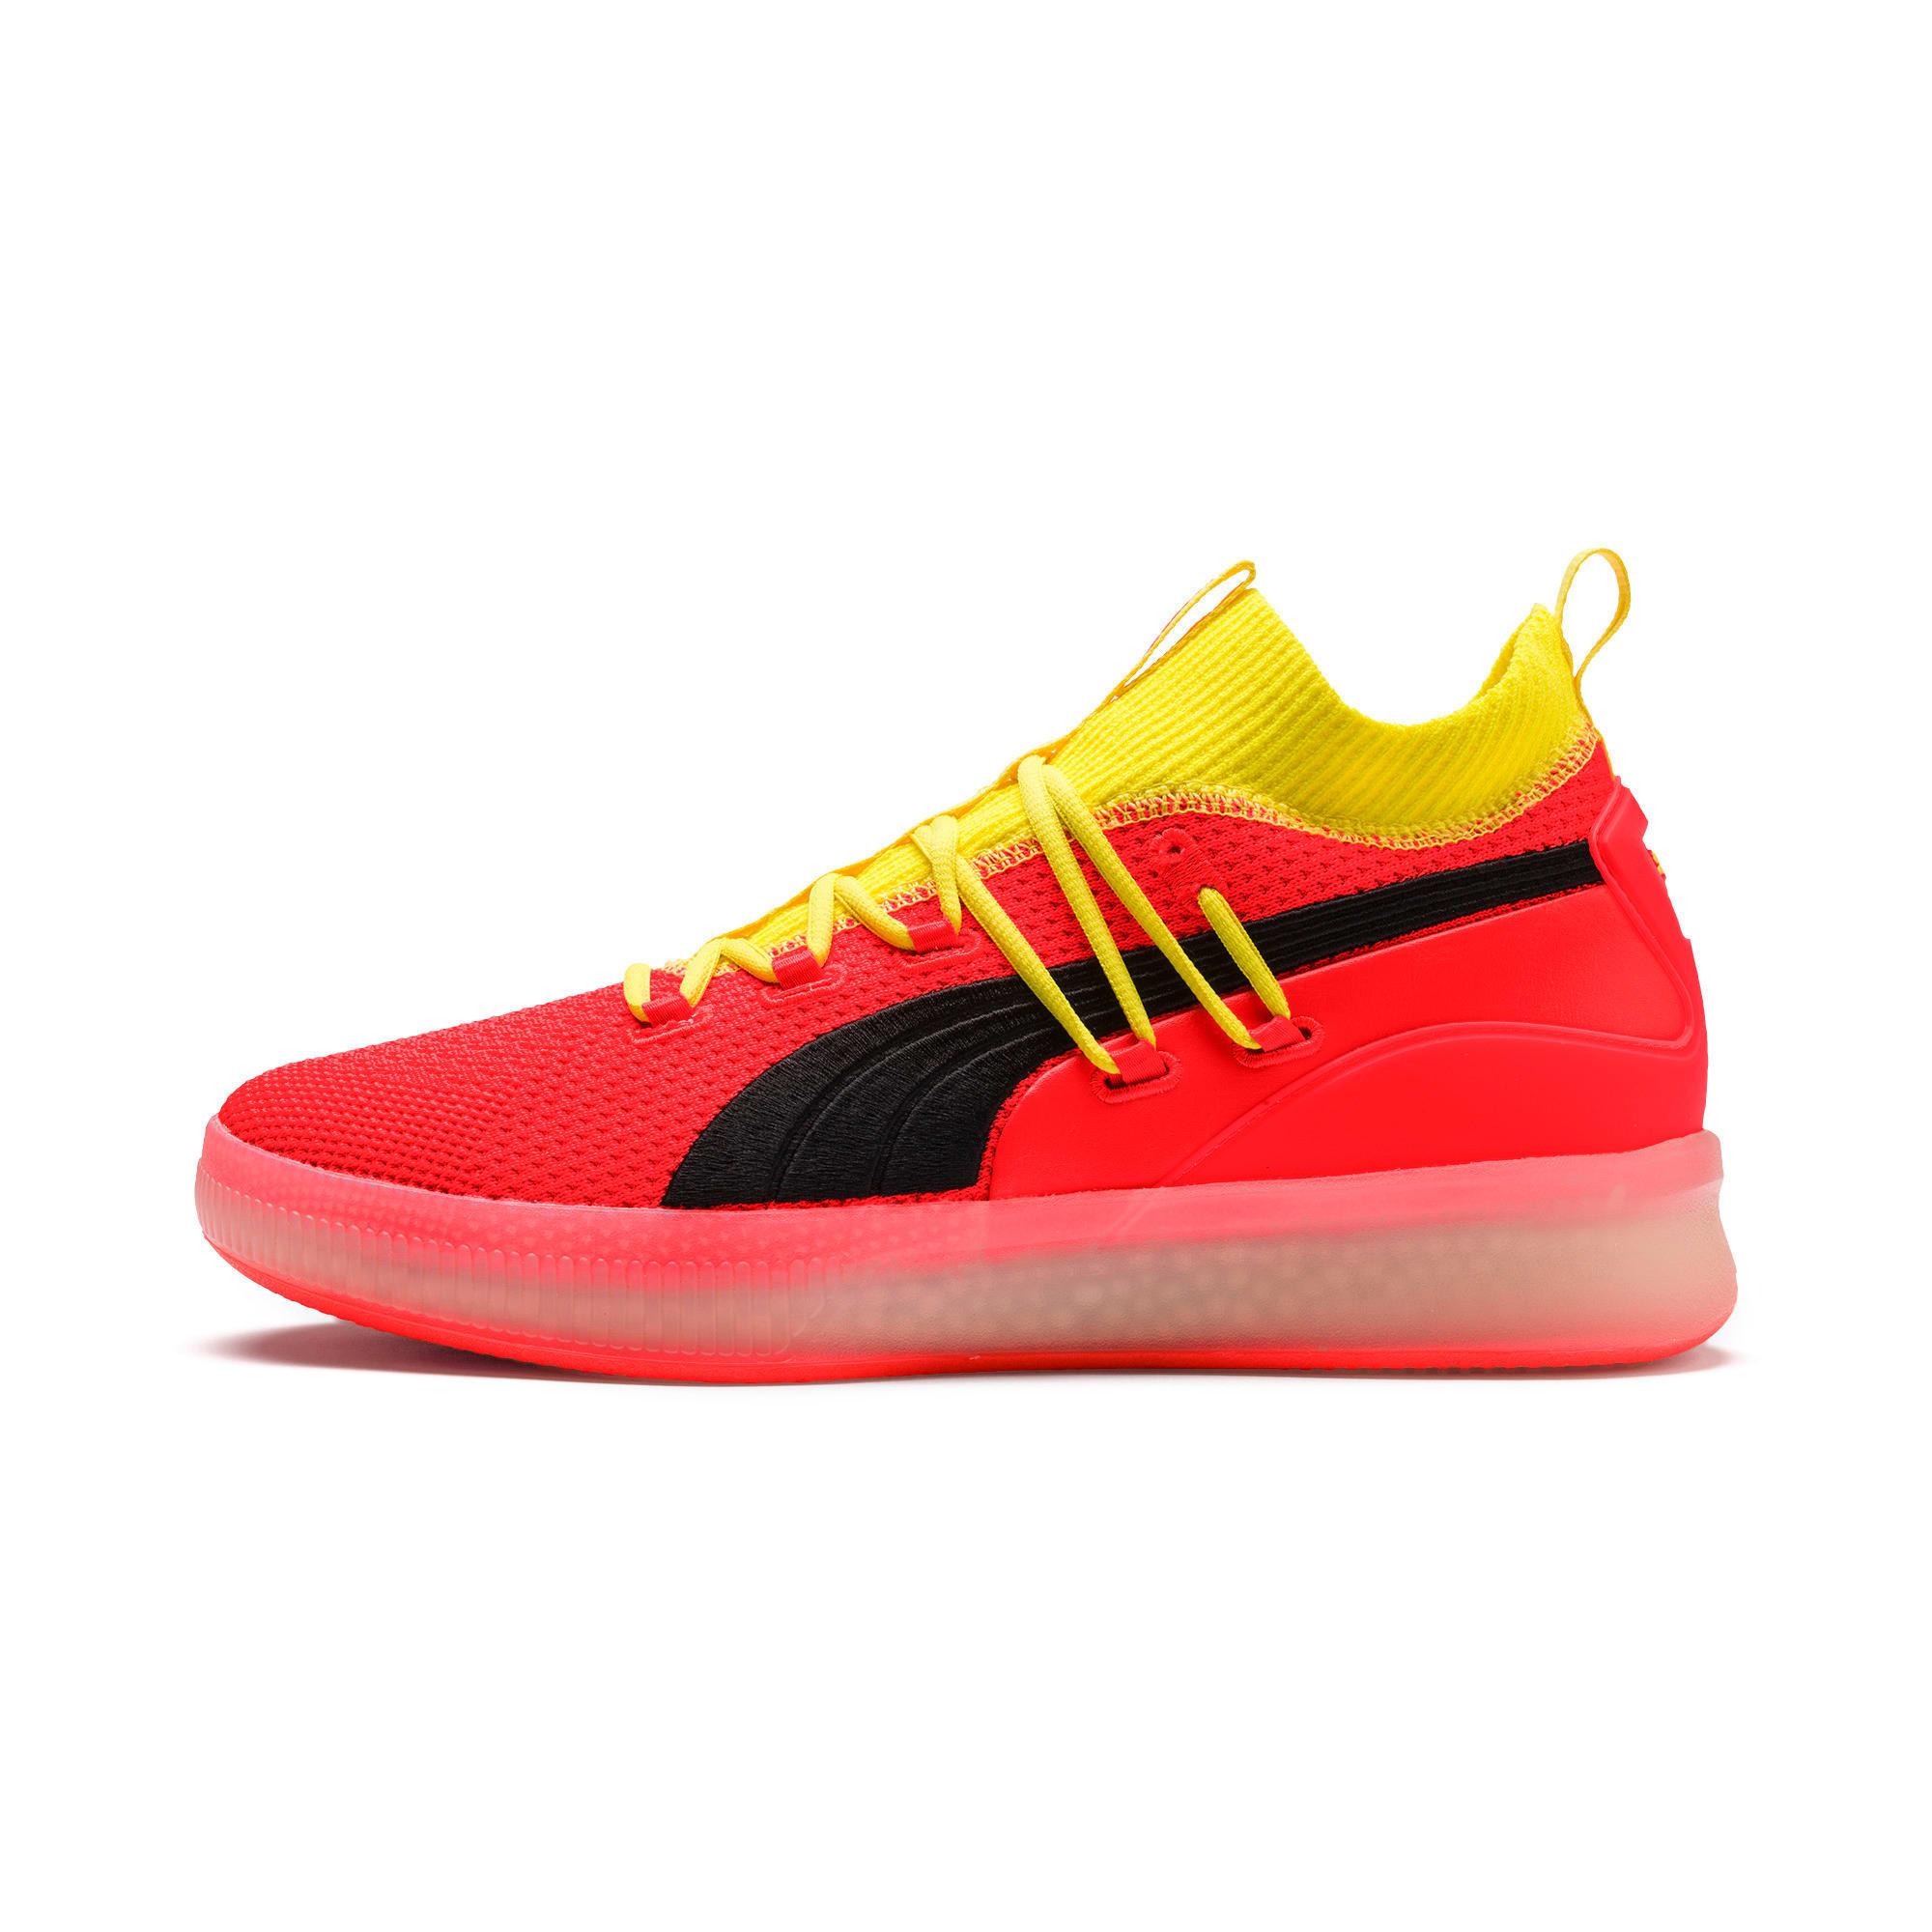 Scarpe da basket Clyde Court Disrupt uomo